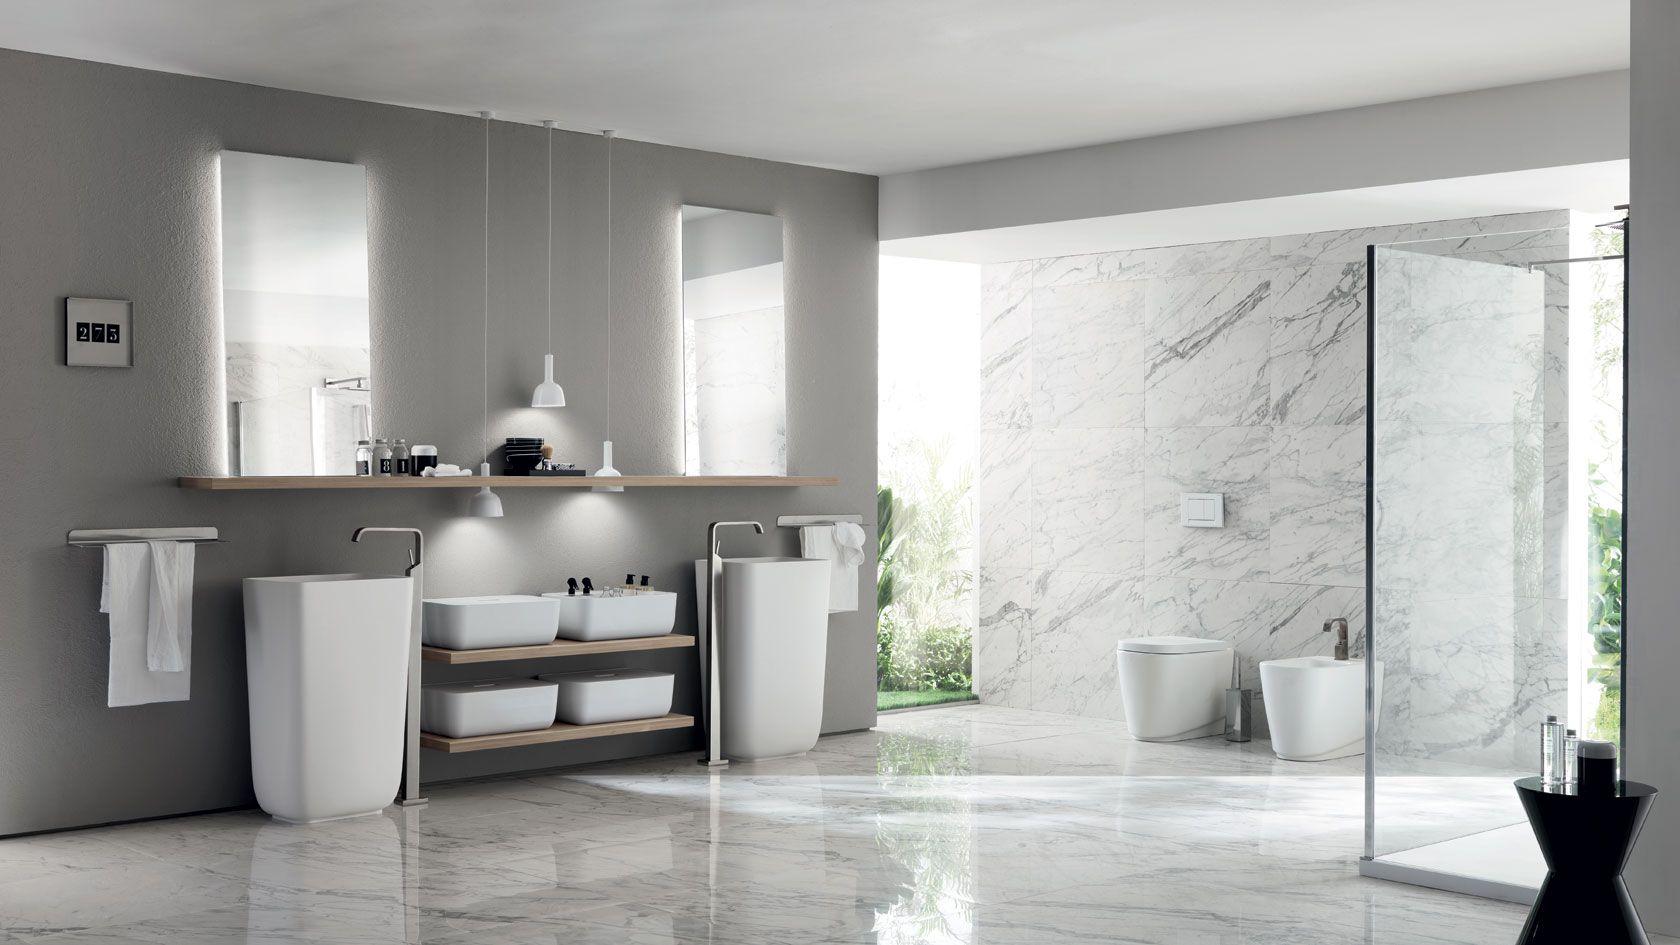 Italian Design Bathroom - Home Design Ideas